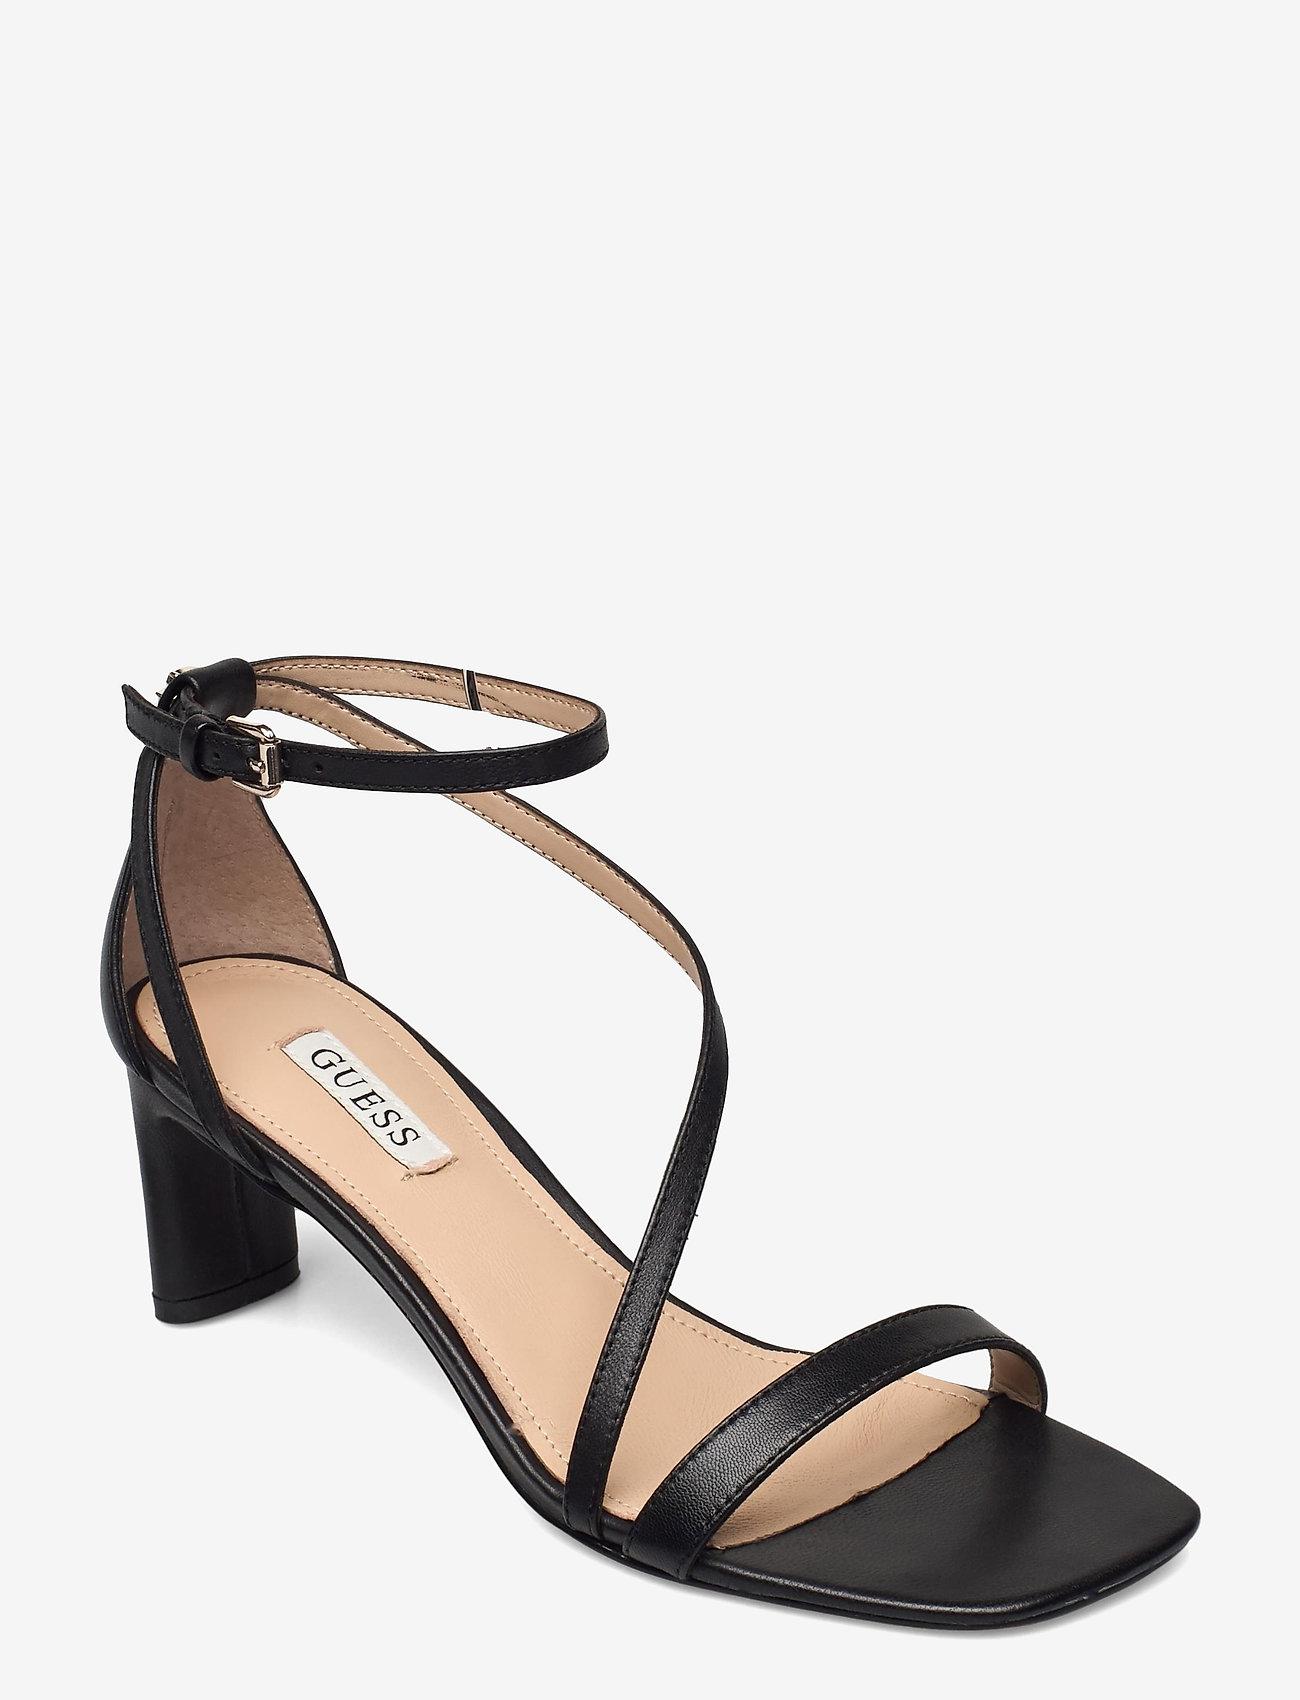 GUESS - SELBY2/SANDALO (SANDAL)/LEATHE - sandales à talons - black - 0